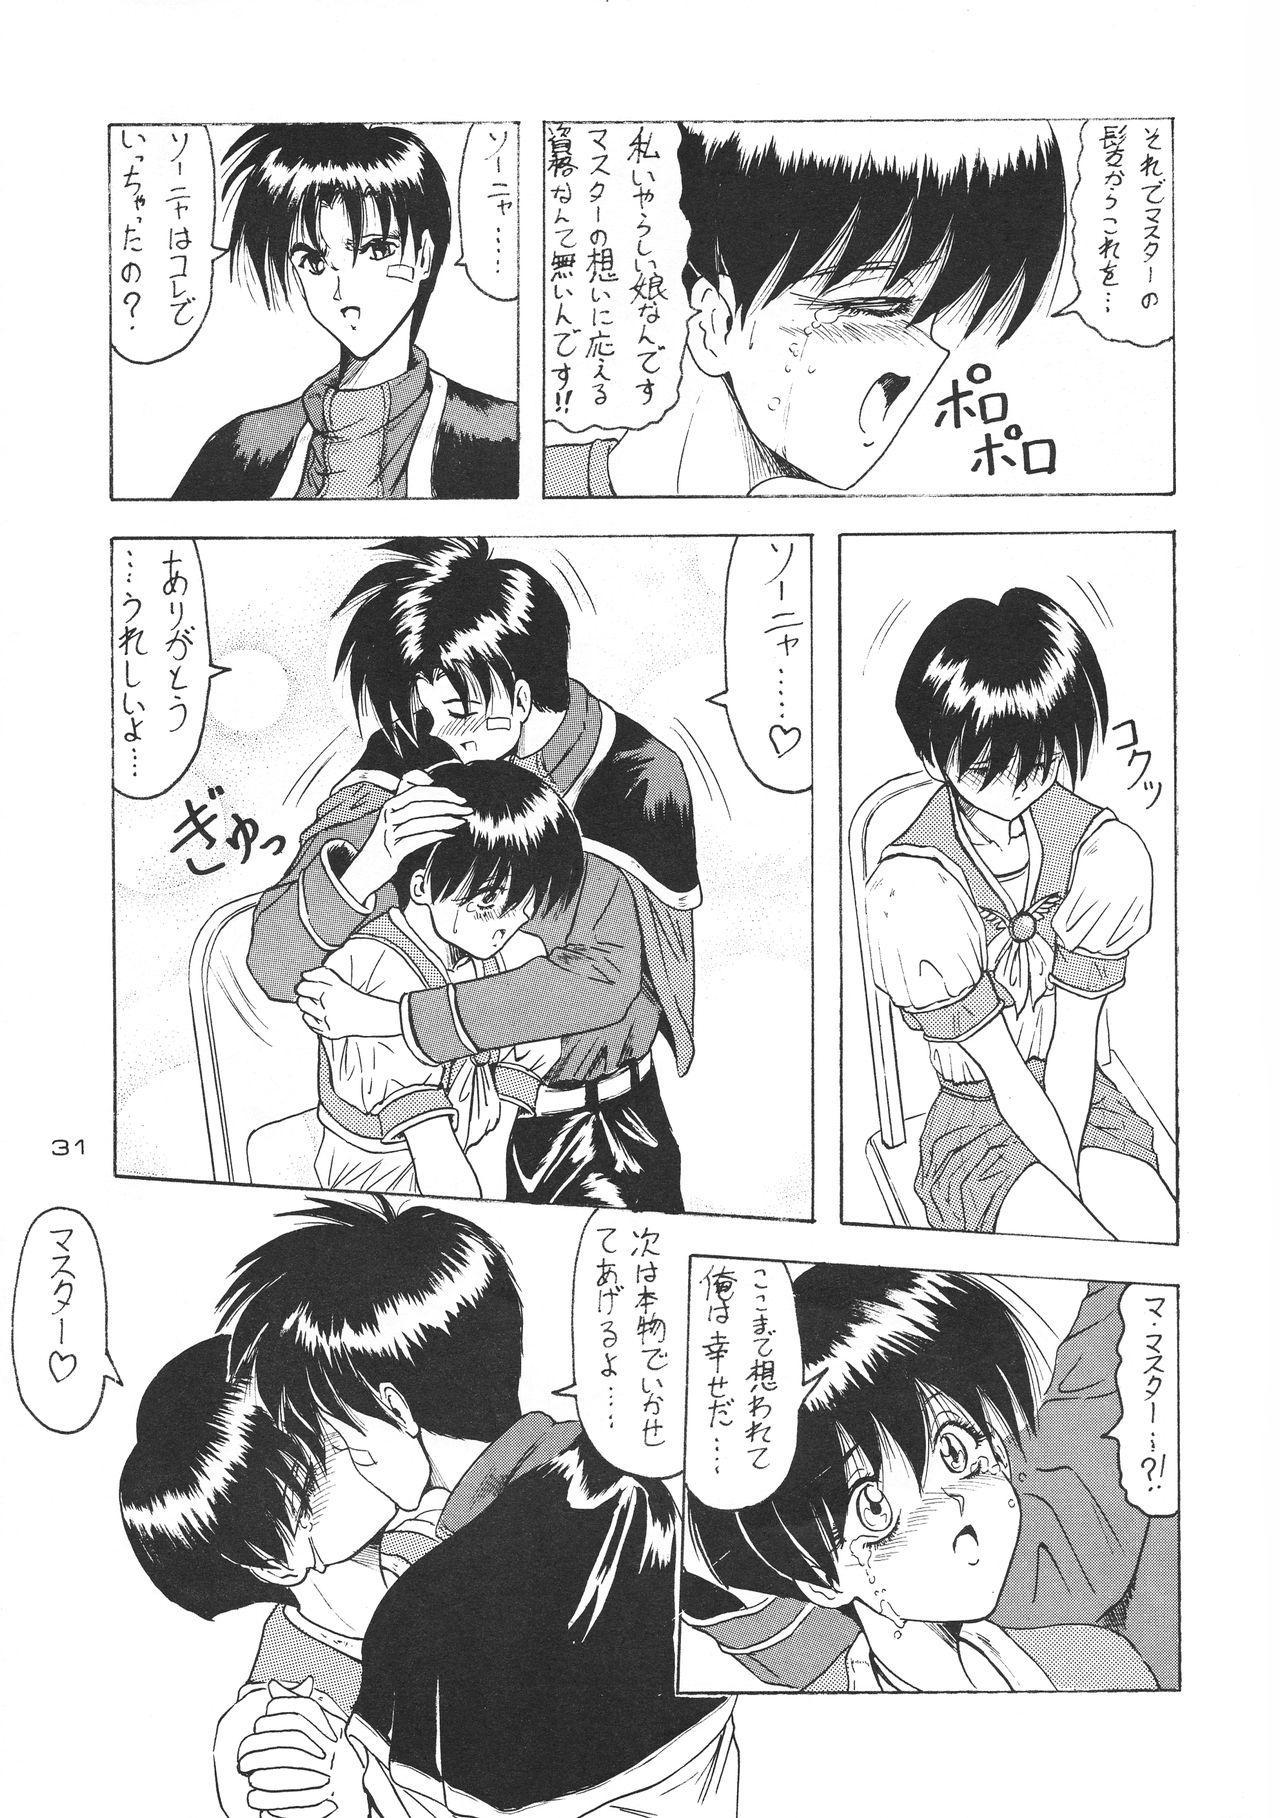 (C51) [J's Style (Jamming)] D2 (DOUBT TO DOUBT) Jamming Kojinshi 4 -Ditsuu- (Various) 30